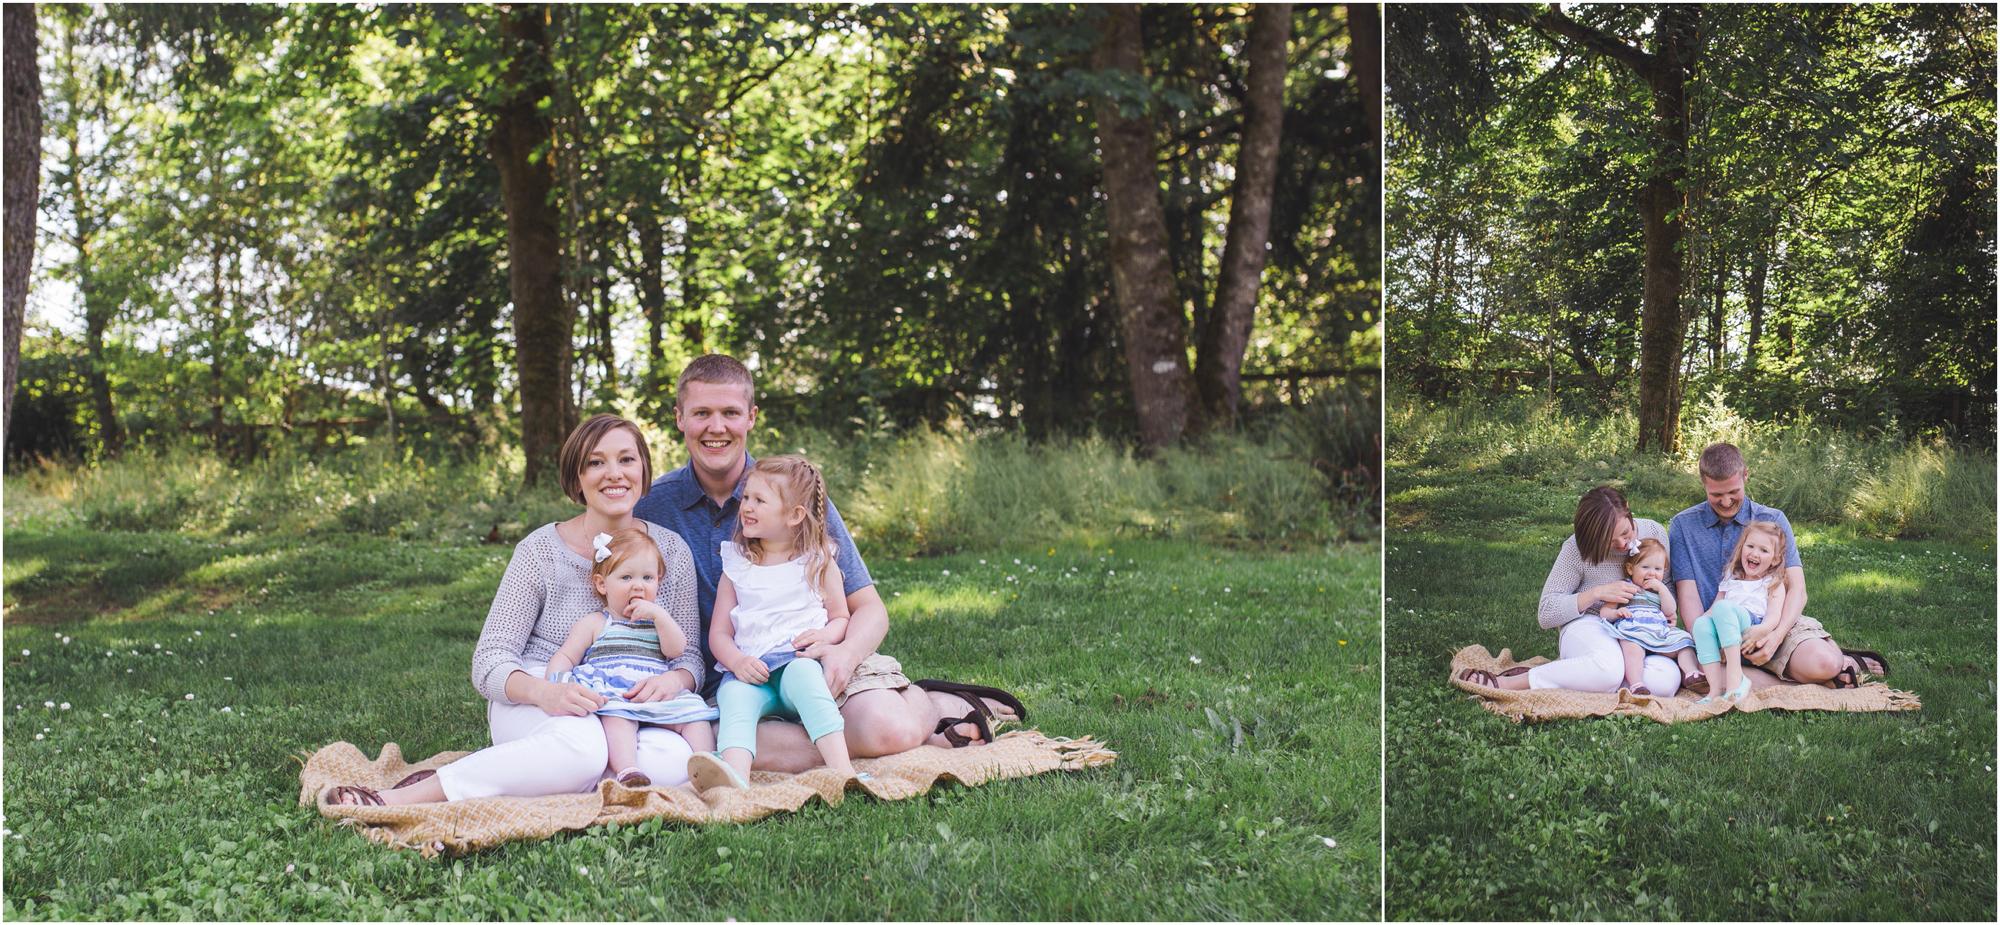 ashley vos photography seattle lifestyle family photographer_0291.jpg